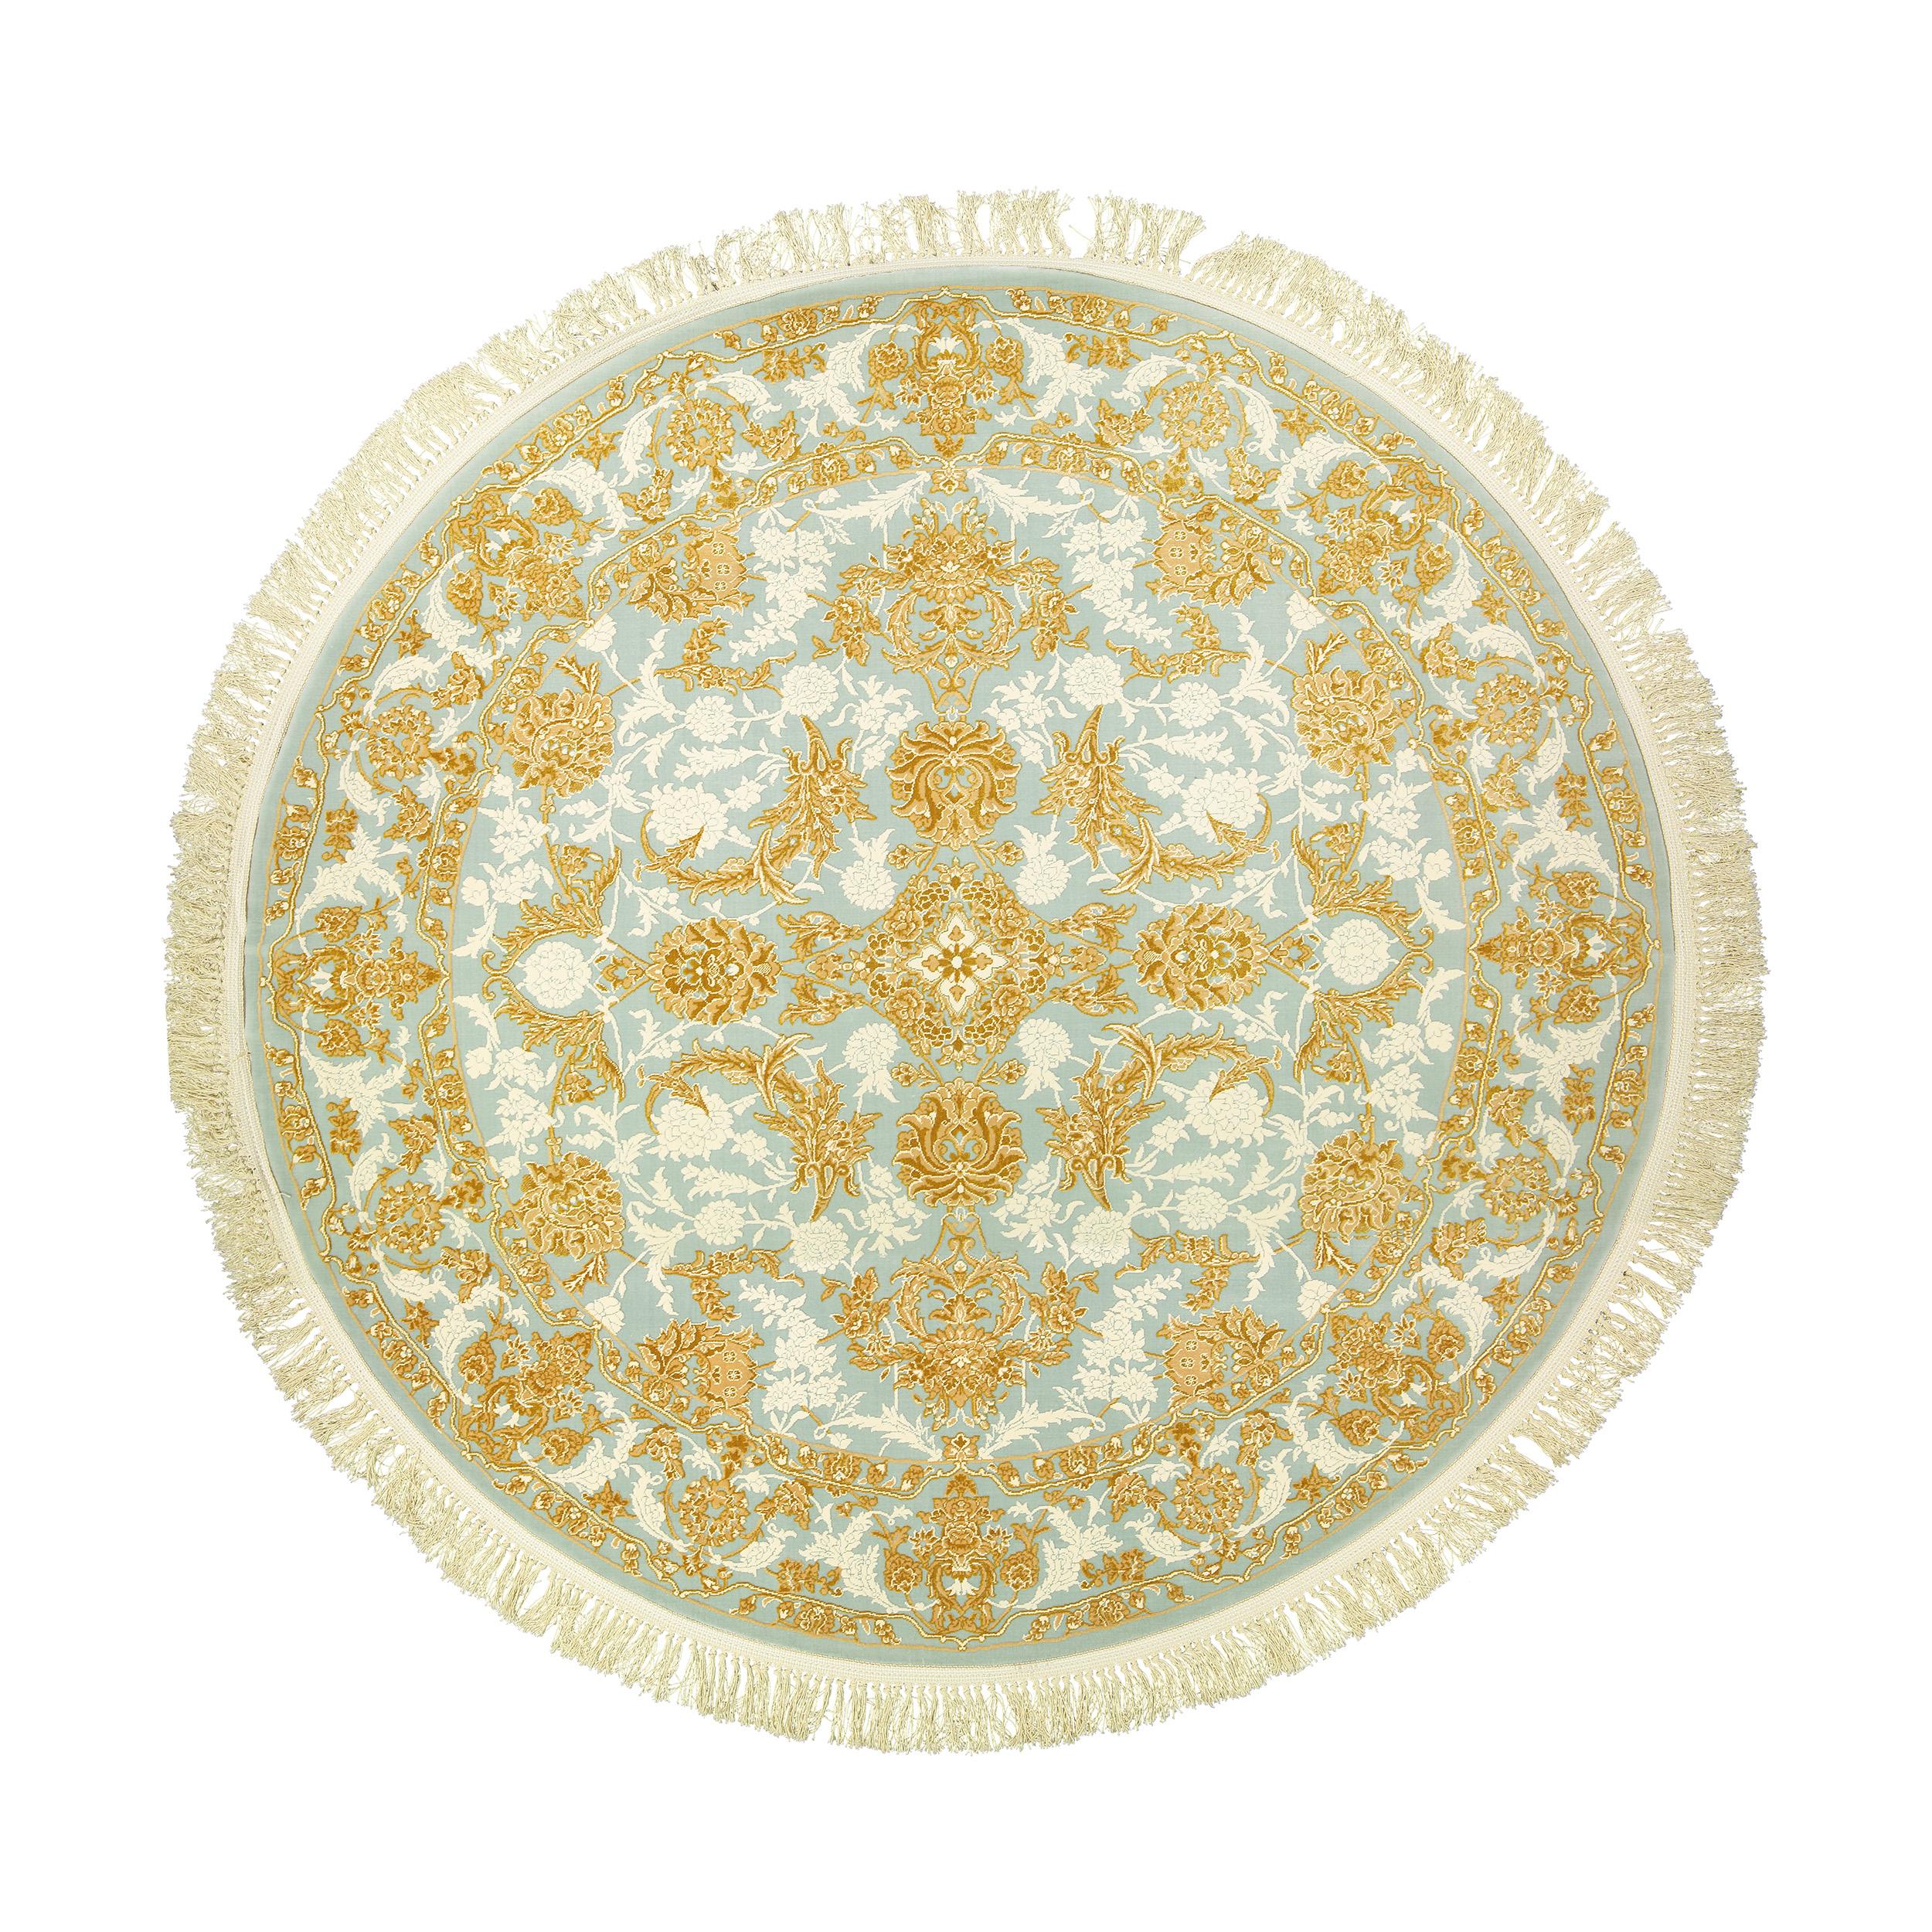 فرش ماشینی عرش طرح سنا کد R زمینه آبی